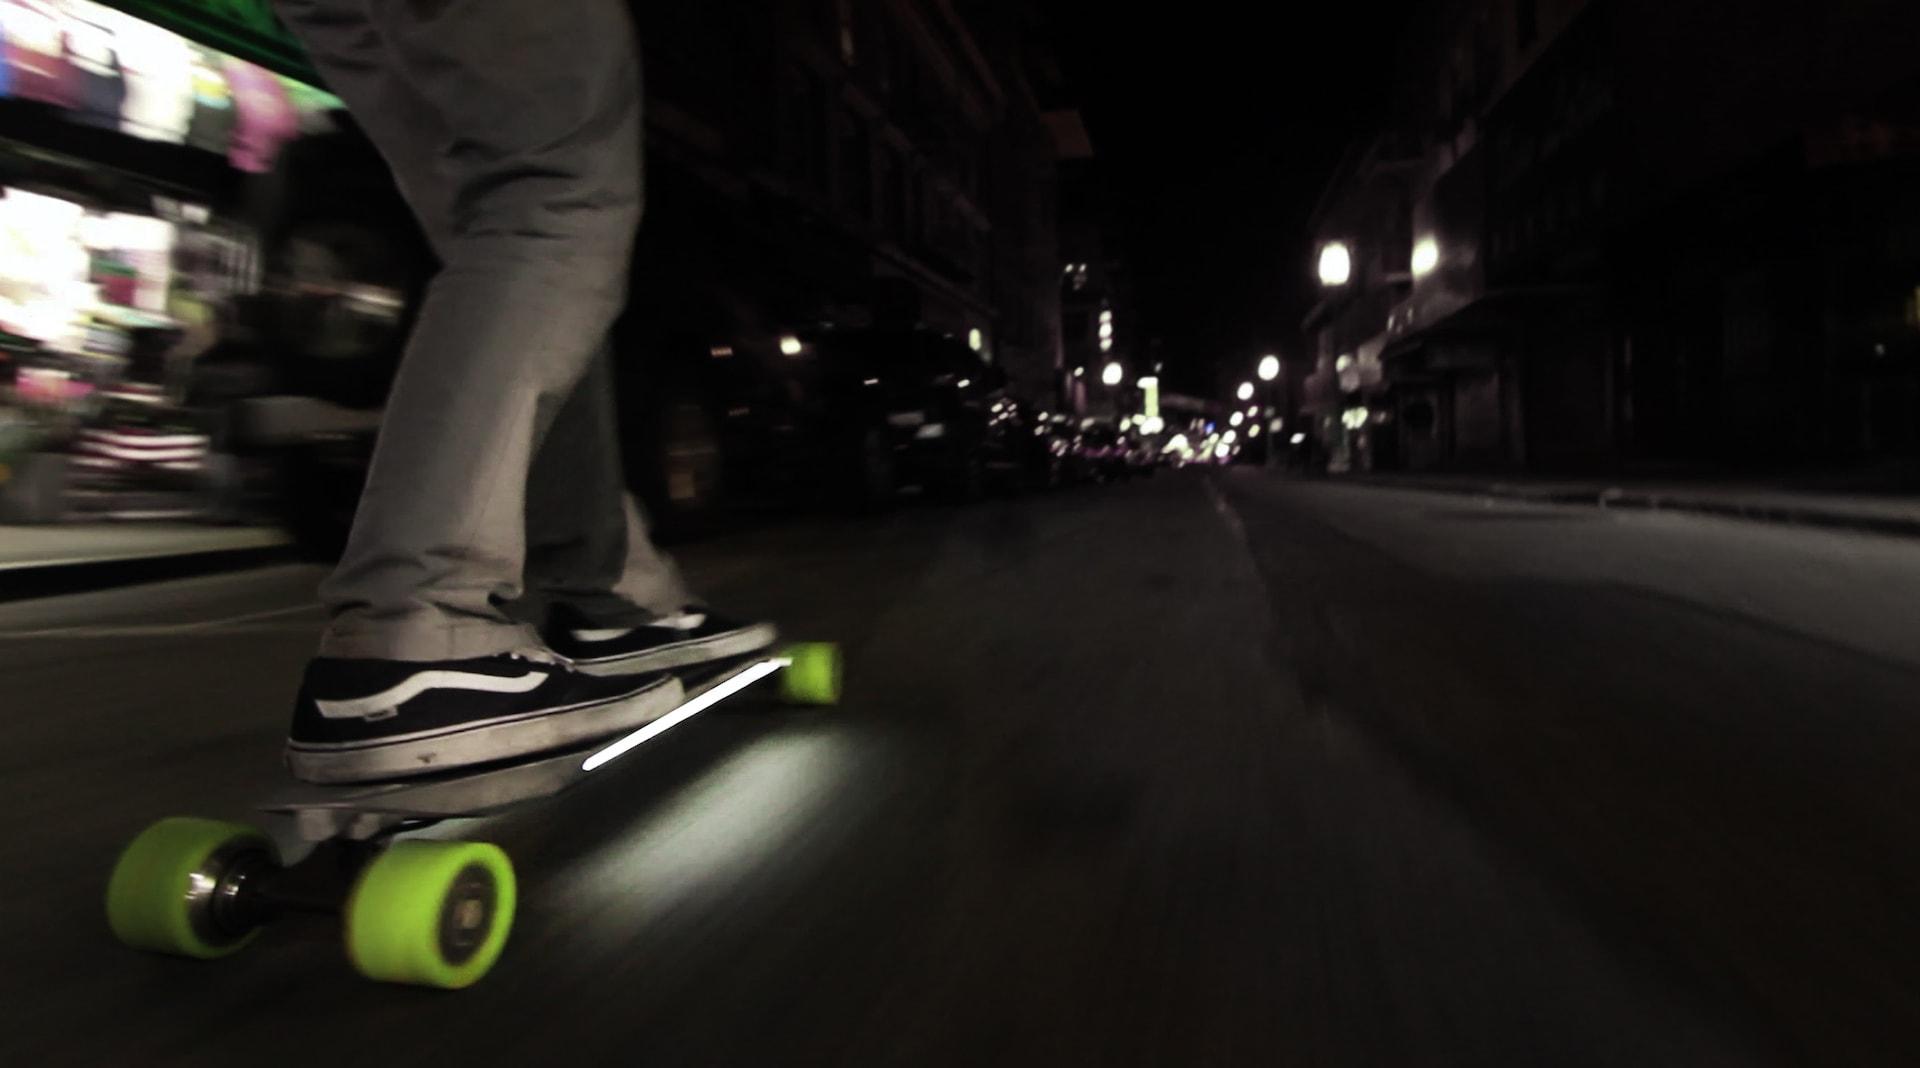 Acton Blink Qu4tro Electric Longboard